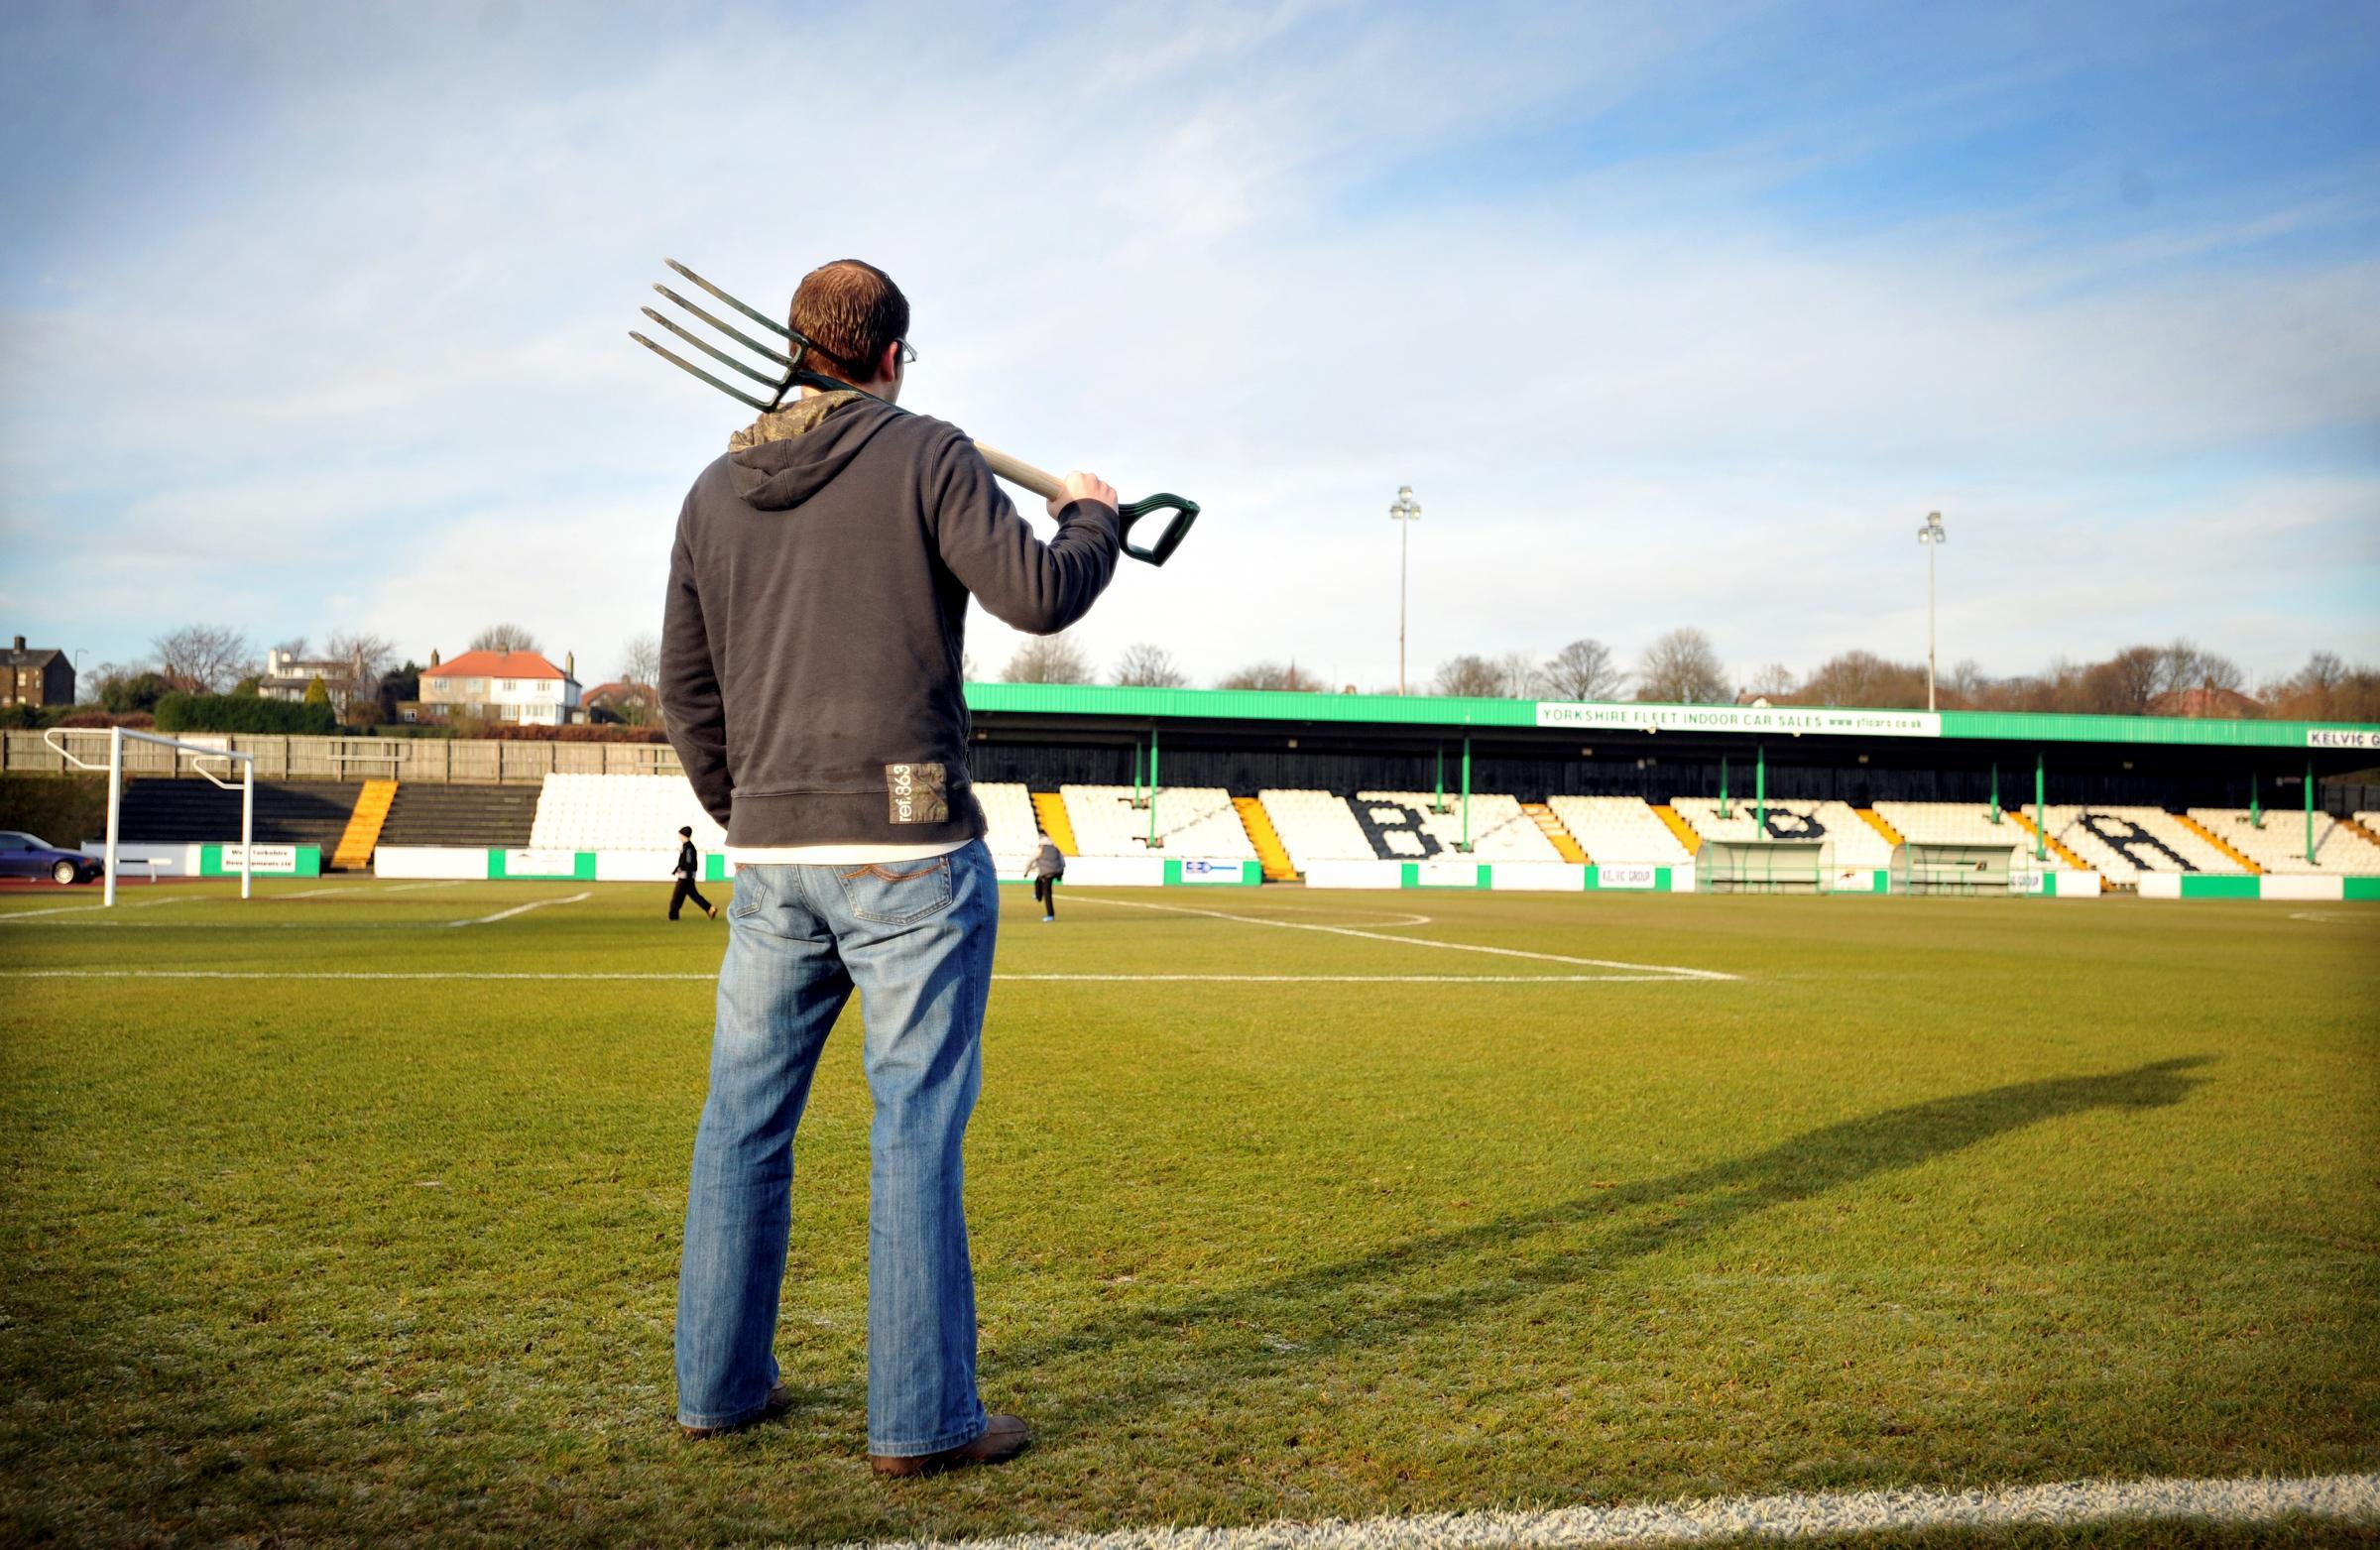 Bradford (Park Avenue) set to sign lease on stadium